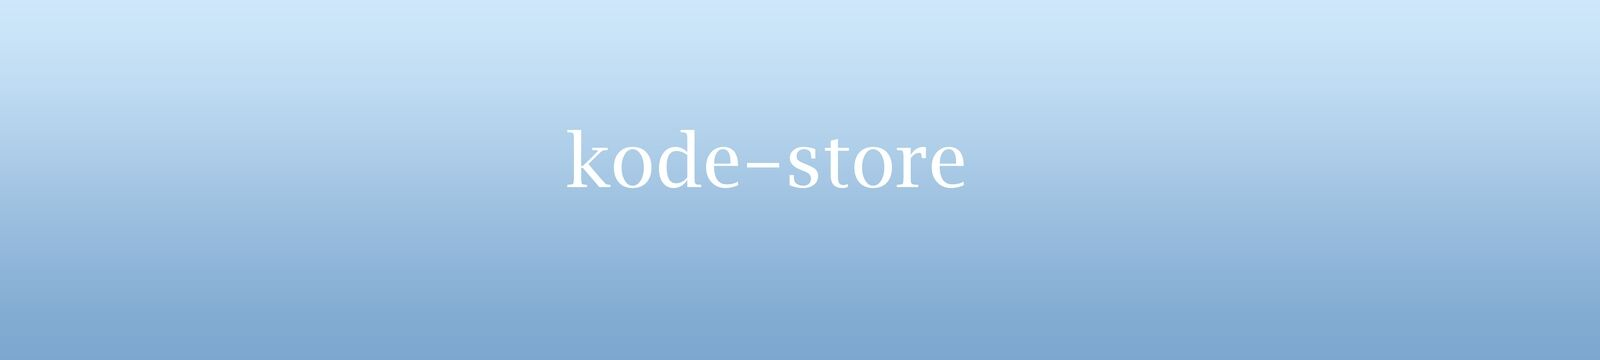 kode-store